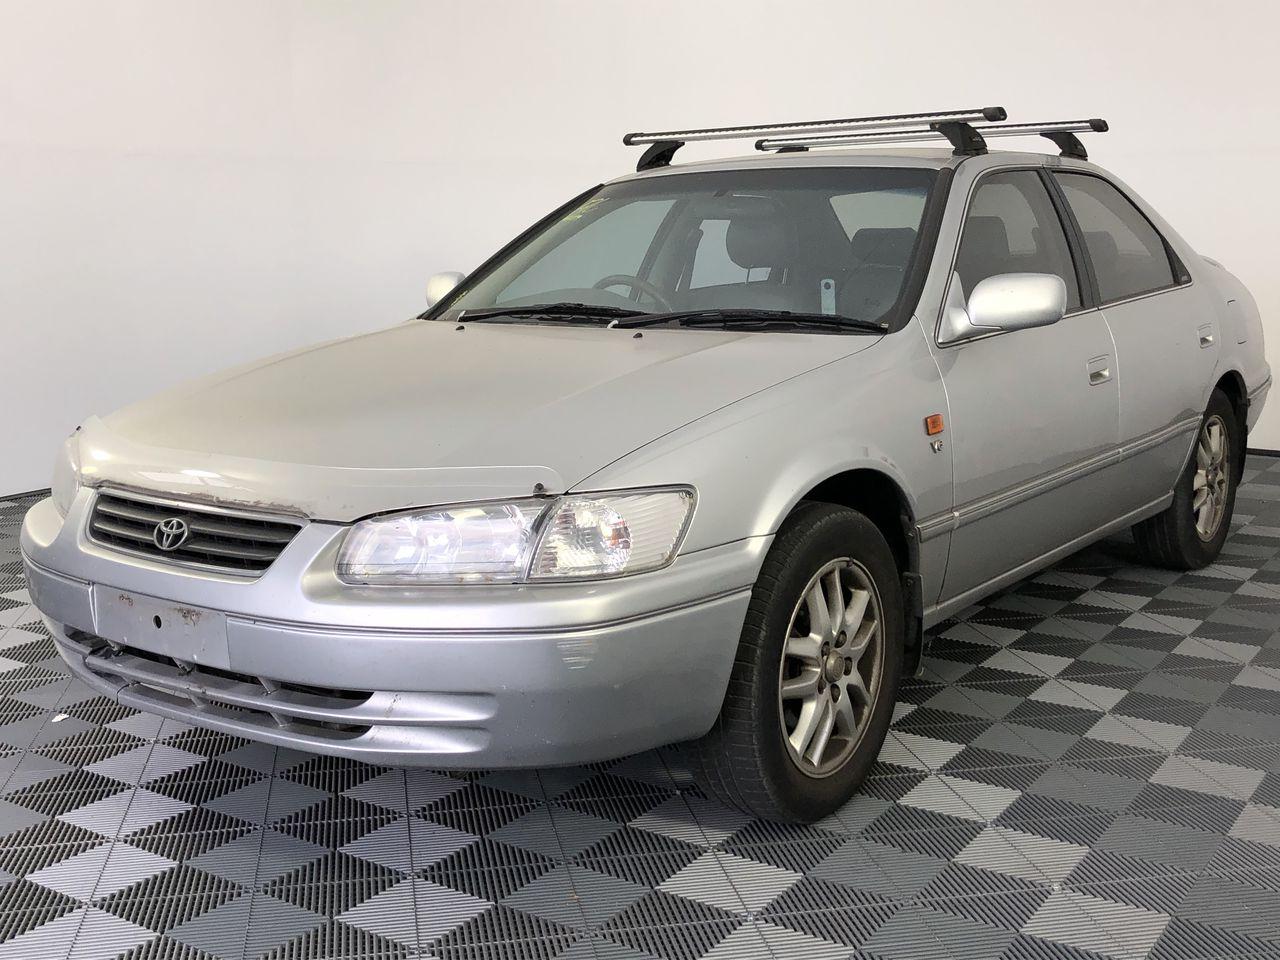 2001 Toyota Camry Azura MCV20R Automatic Sedan